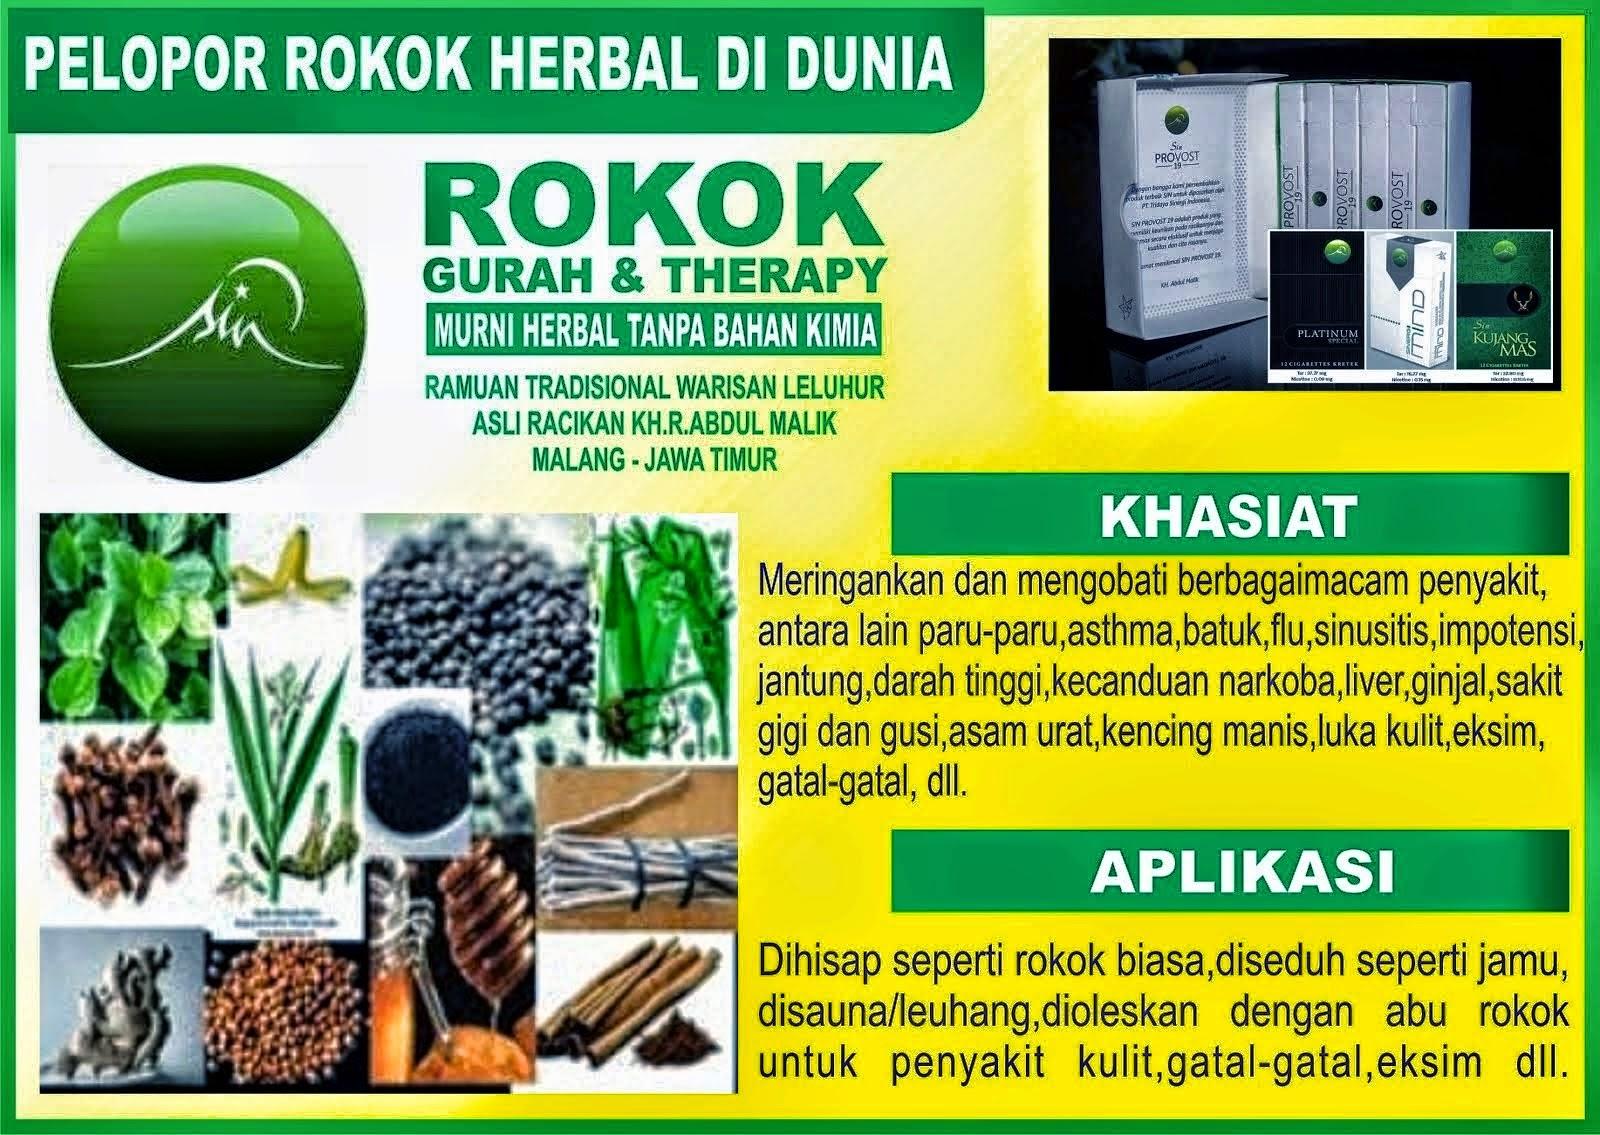 ROKOK HERBAL UTK GURAH&THERAPY BERBAGAI PENYAKIT